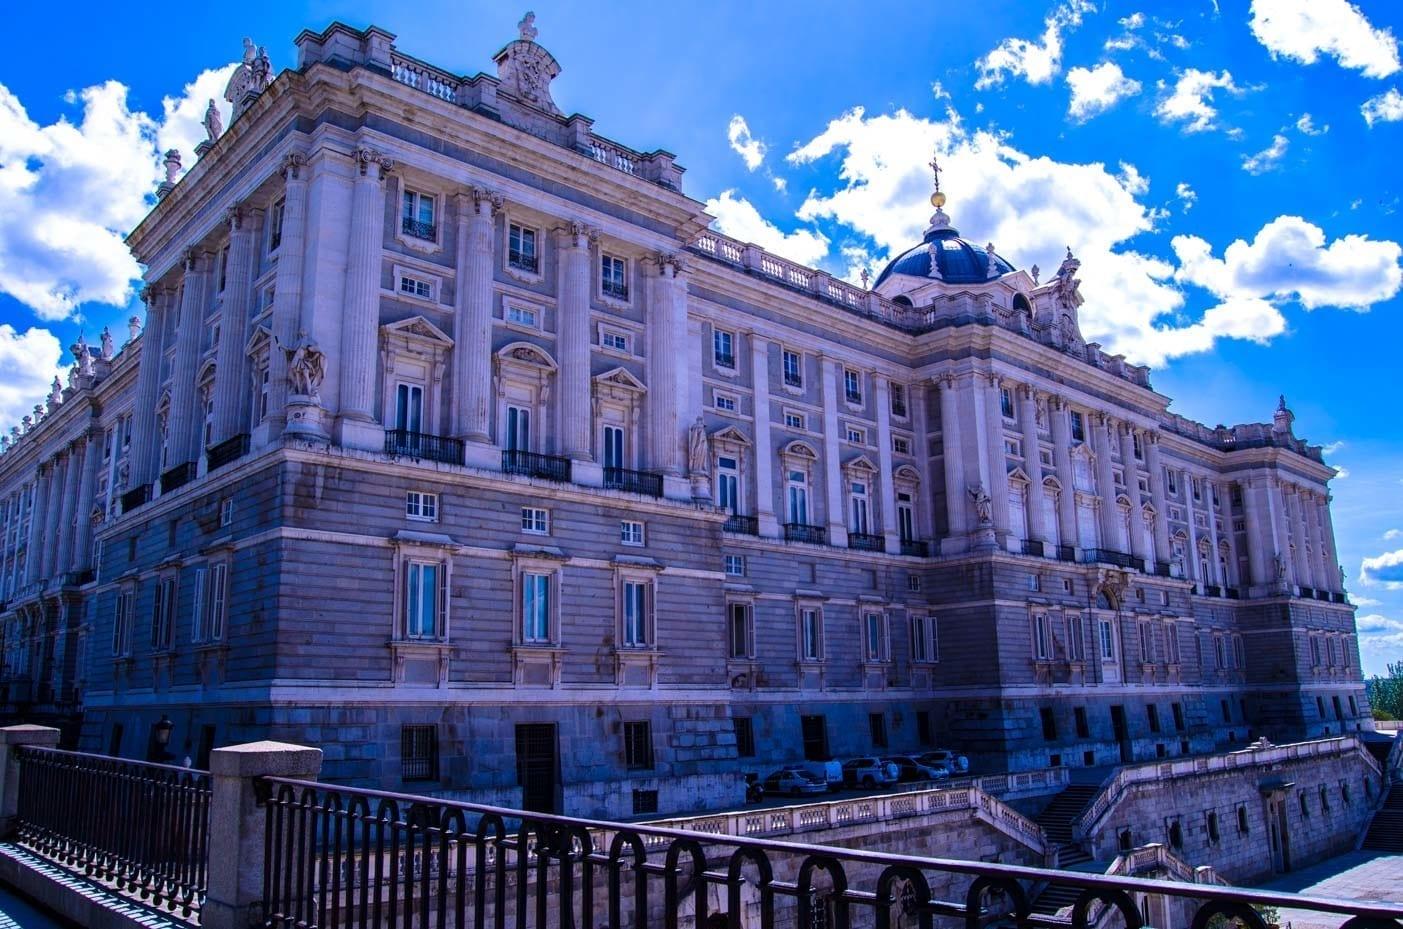 Madrid Royal Palace side view Bailen street